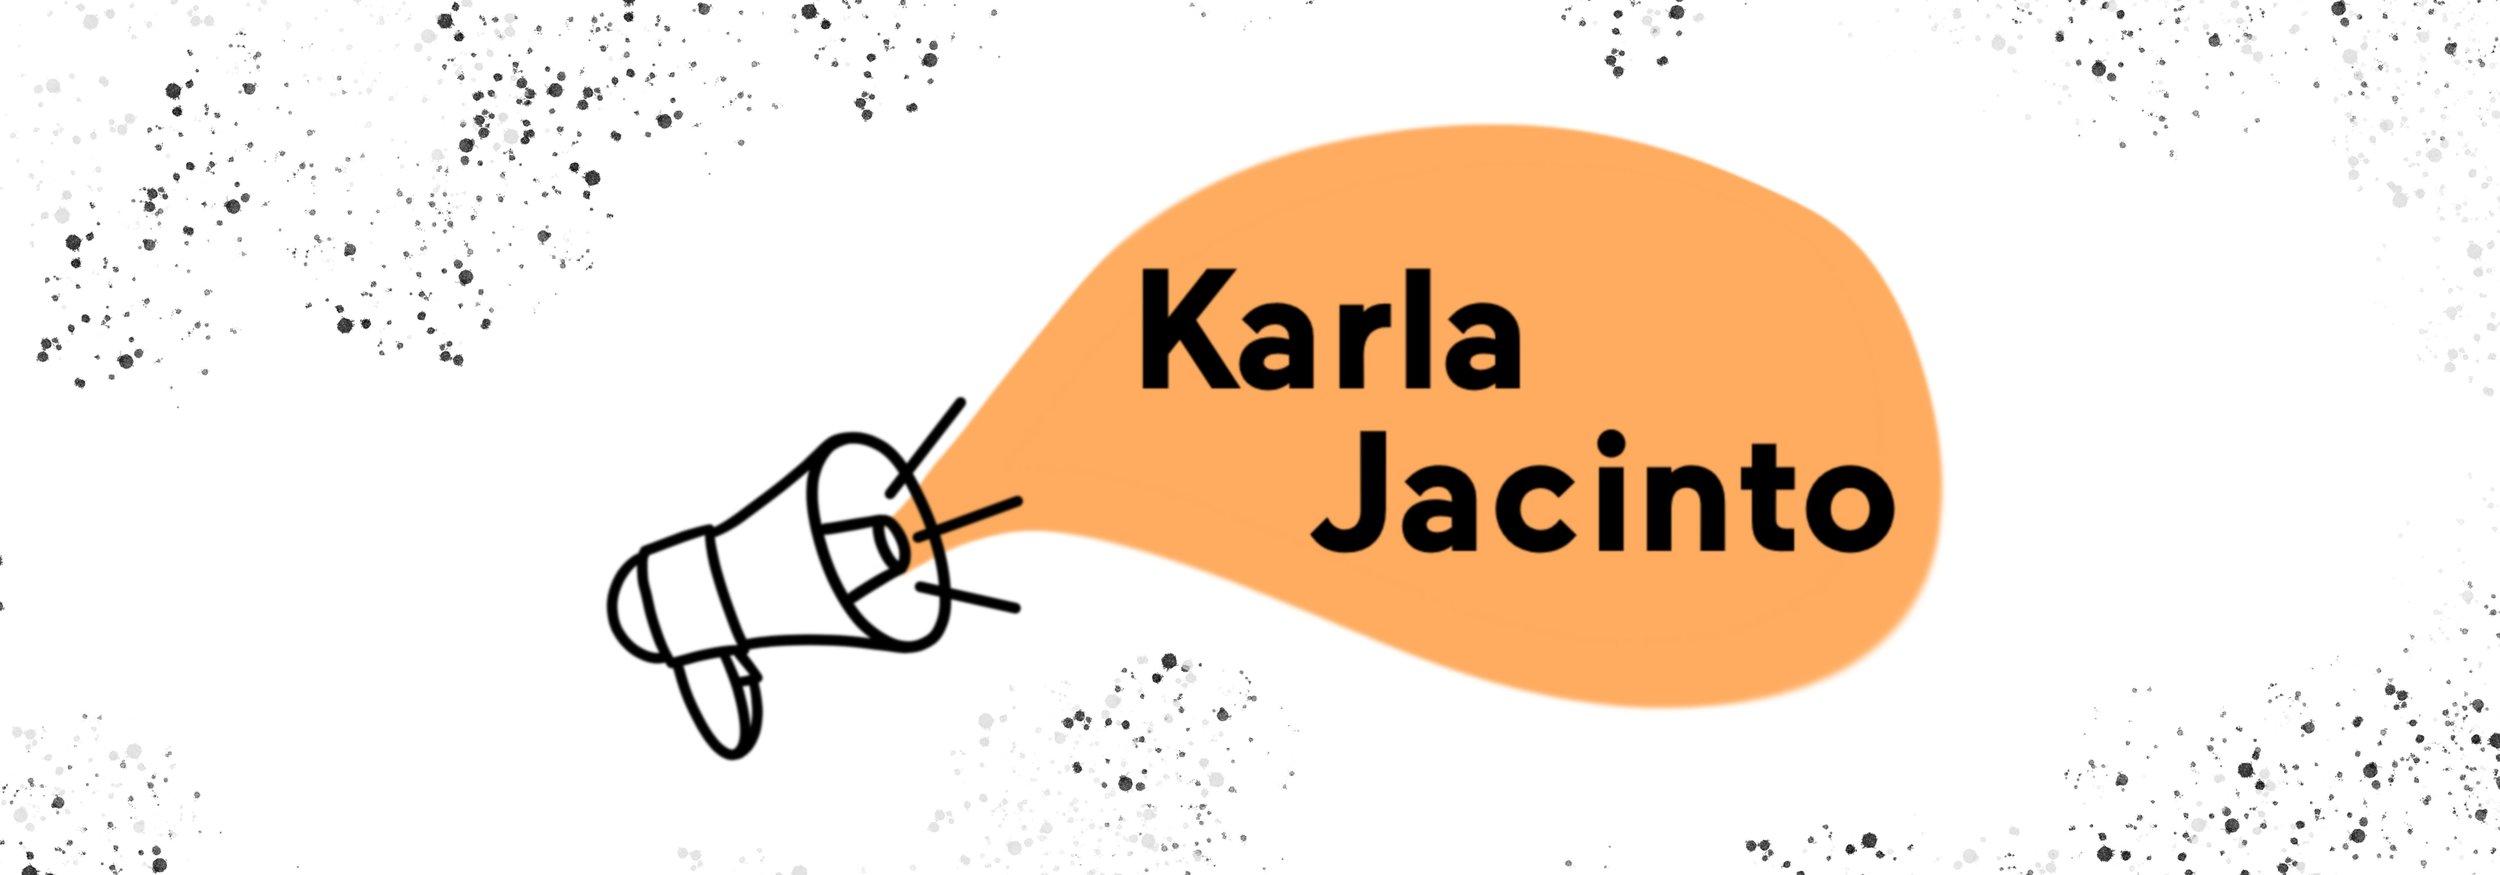 Karla_Jacinto_Website_Banner.jpg